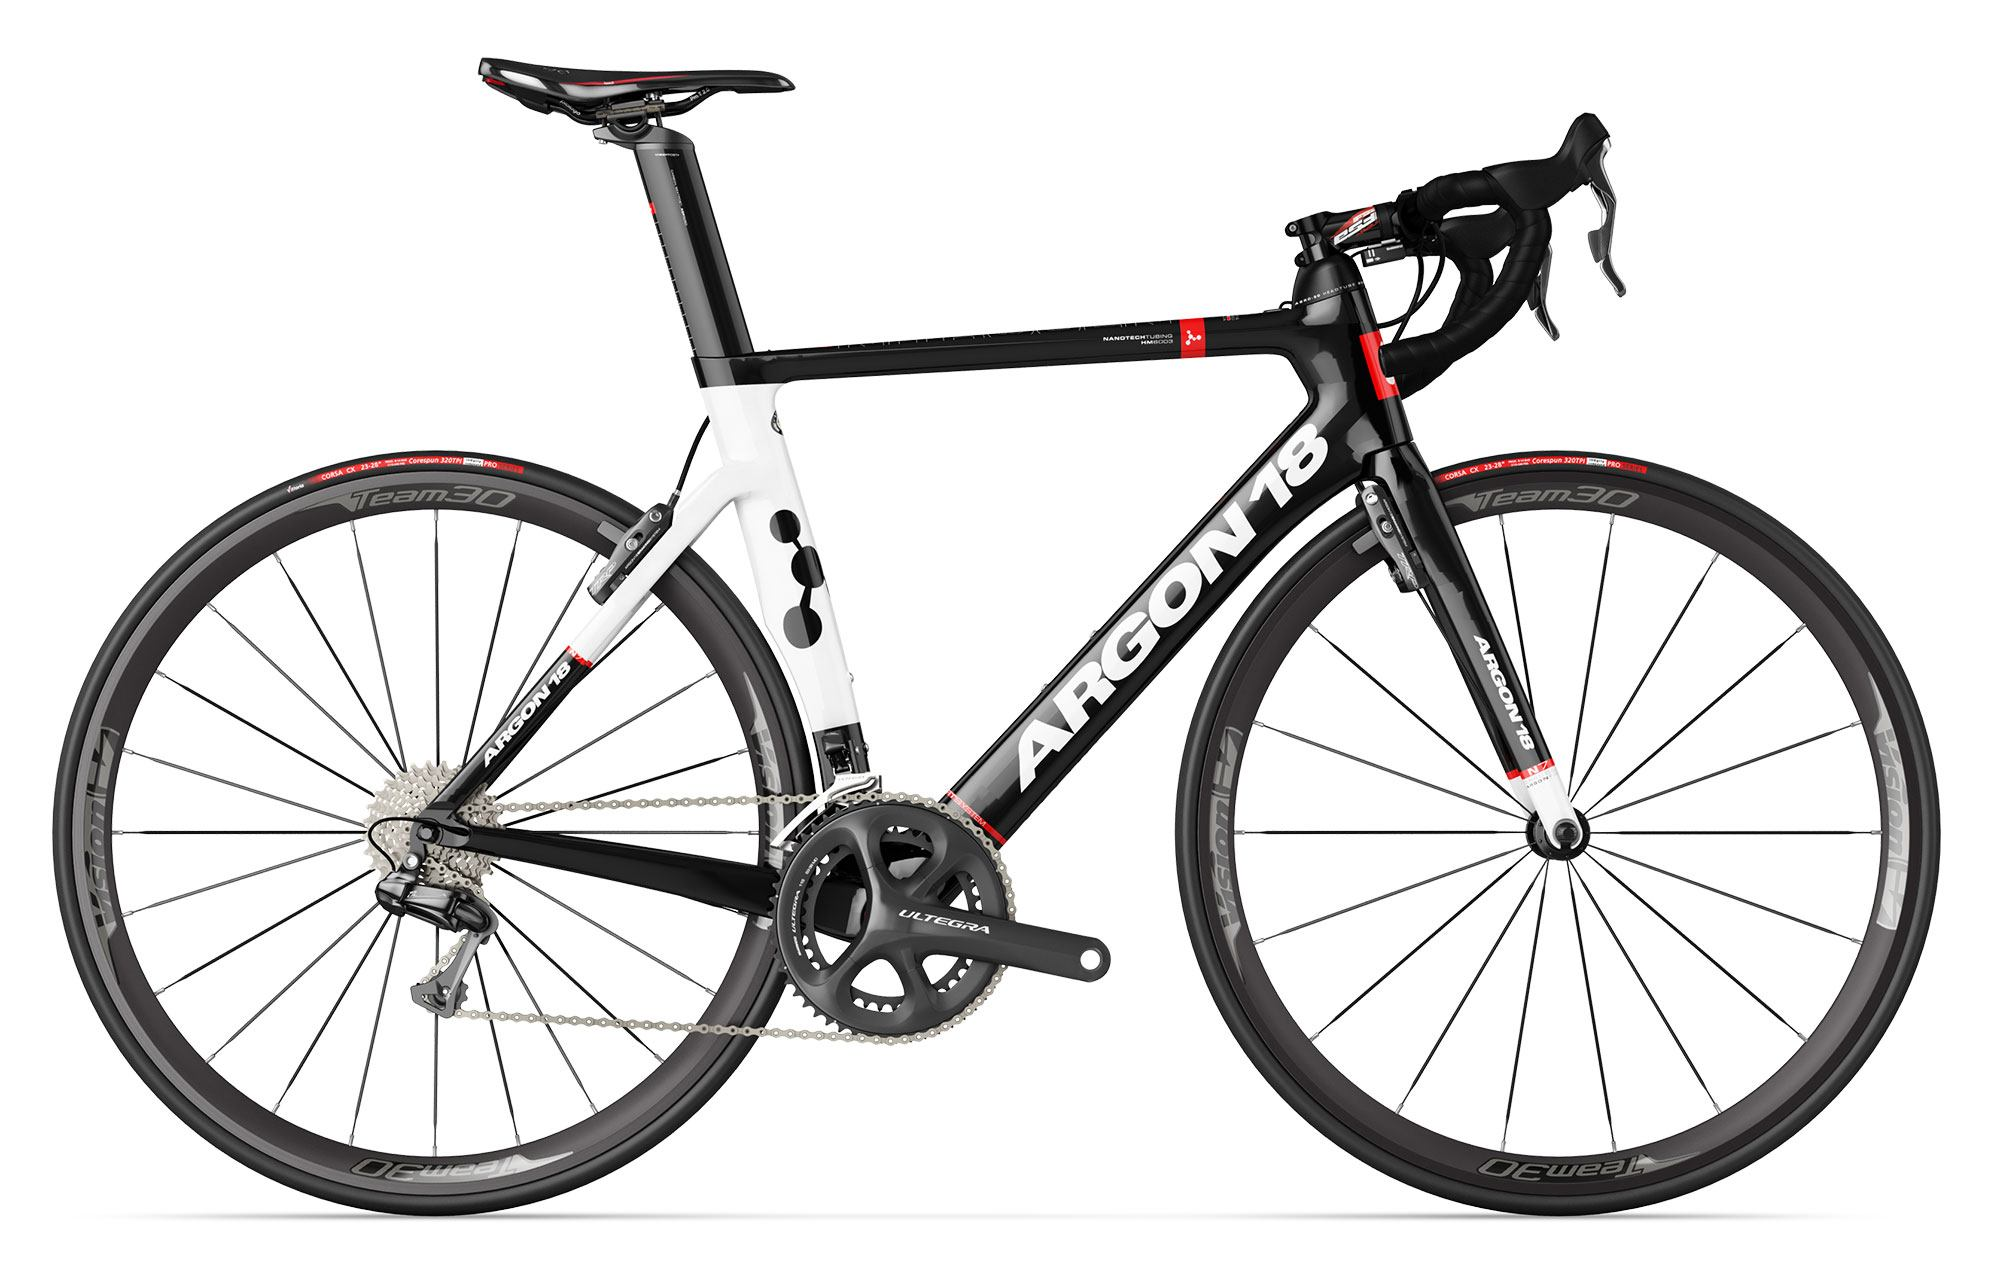 Argon 18 Nitrogen Ultegra Di2 Bike